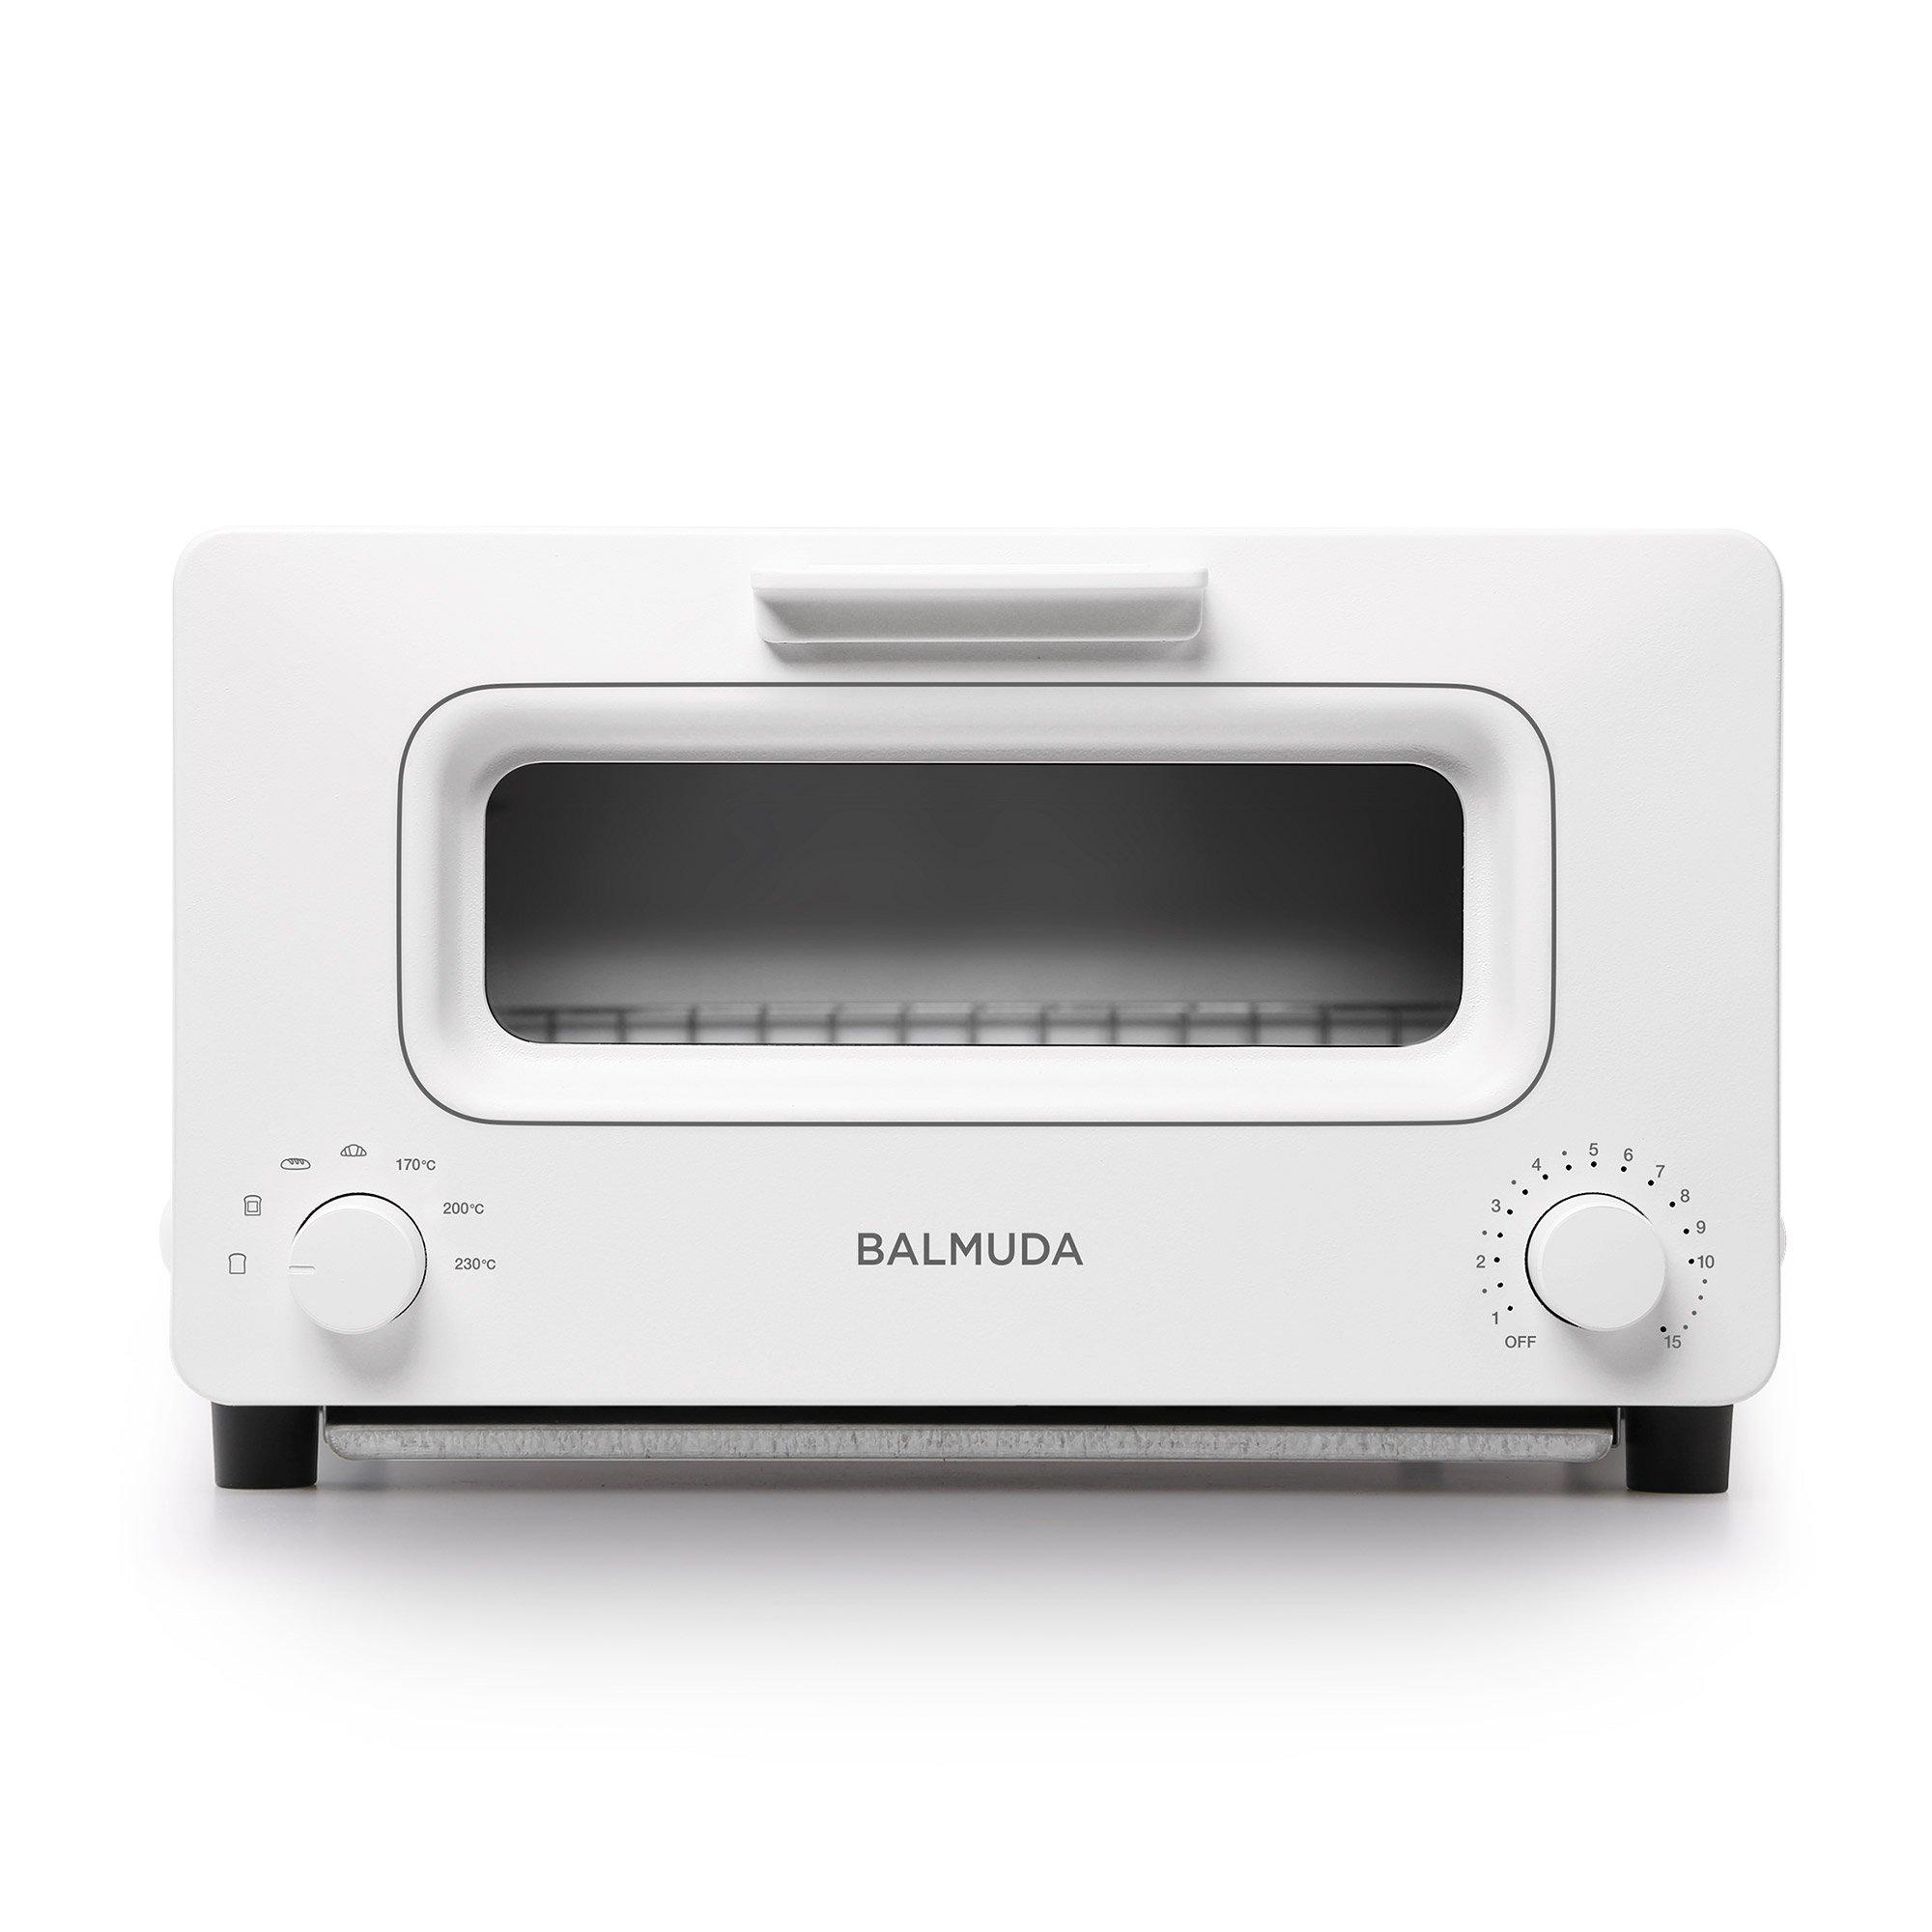 BALMUDA Steam toaster oven ''BALMUDA The Toaster'' K01E-WS (White)【Japan Domestic genuine products】